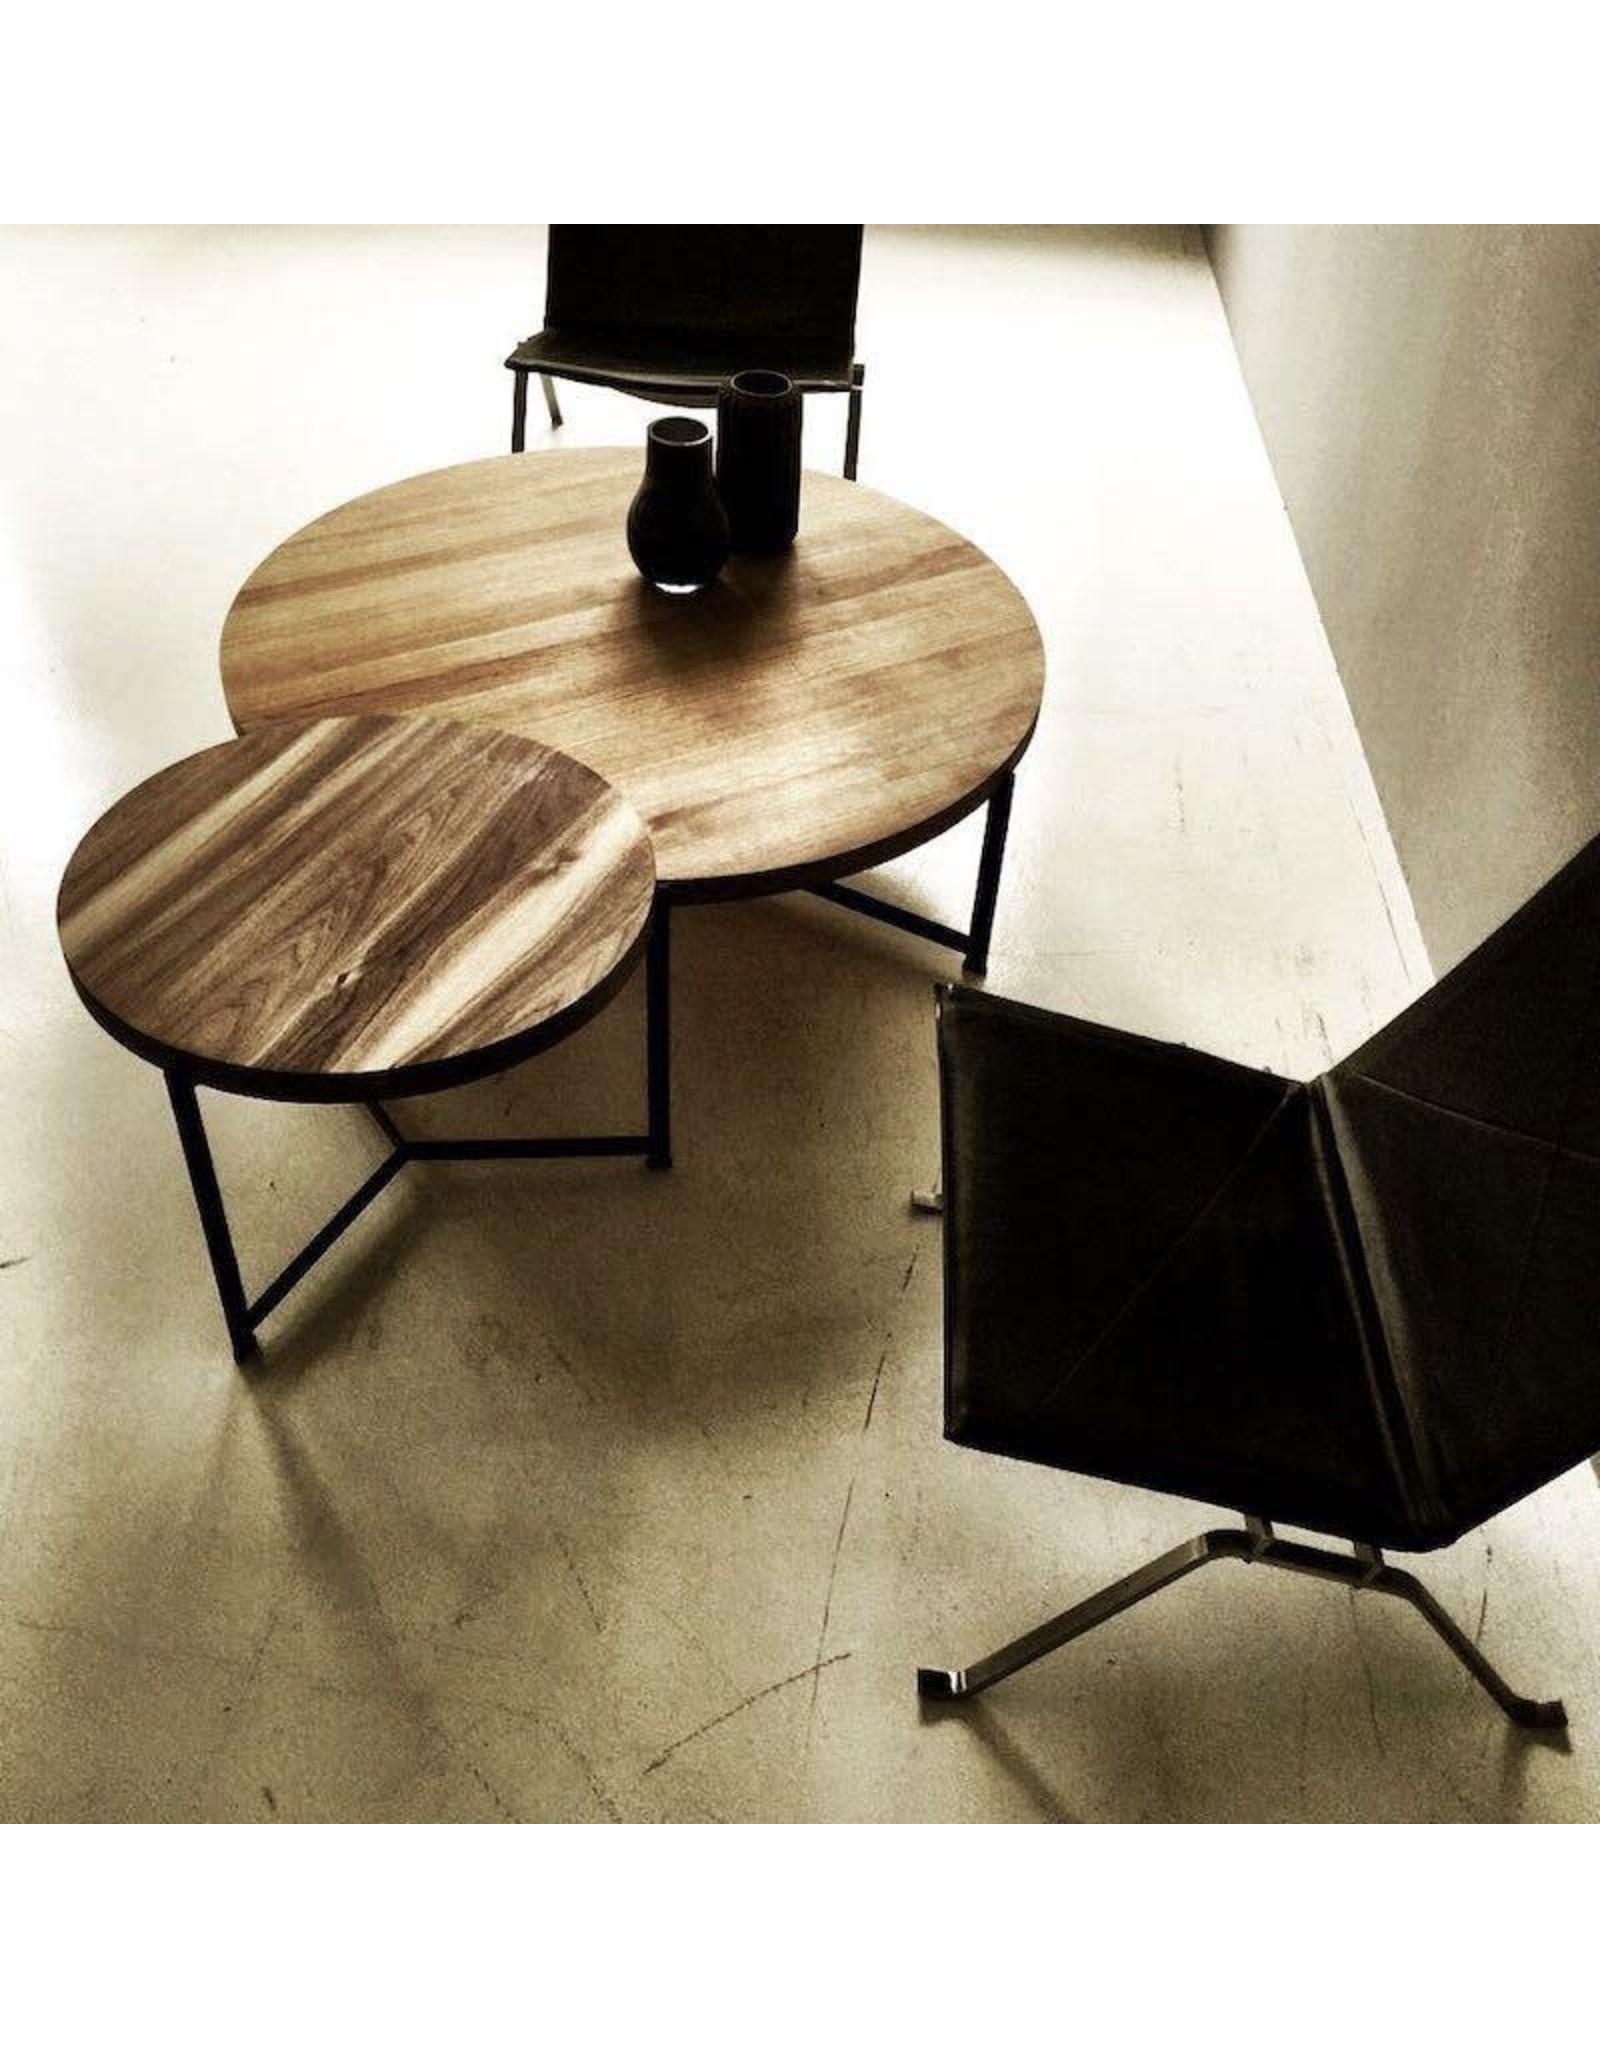 DK3 PLATEAU COFFEE TABLE